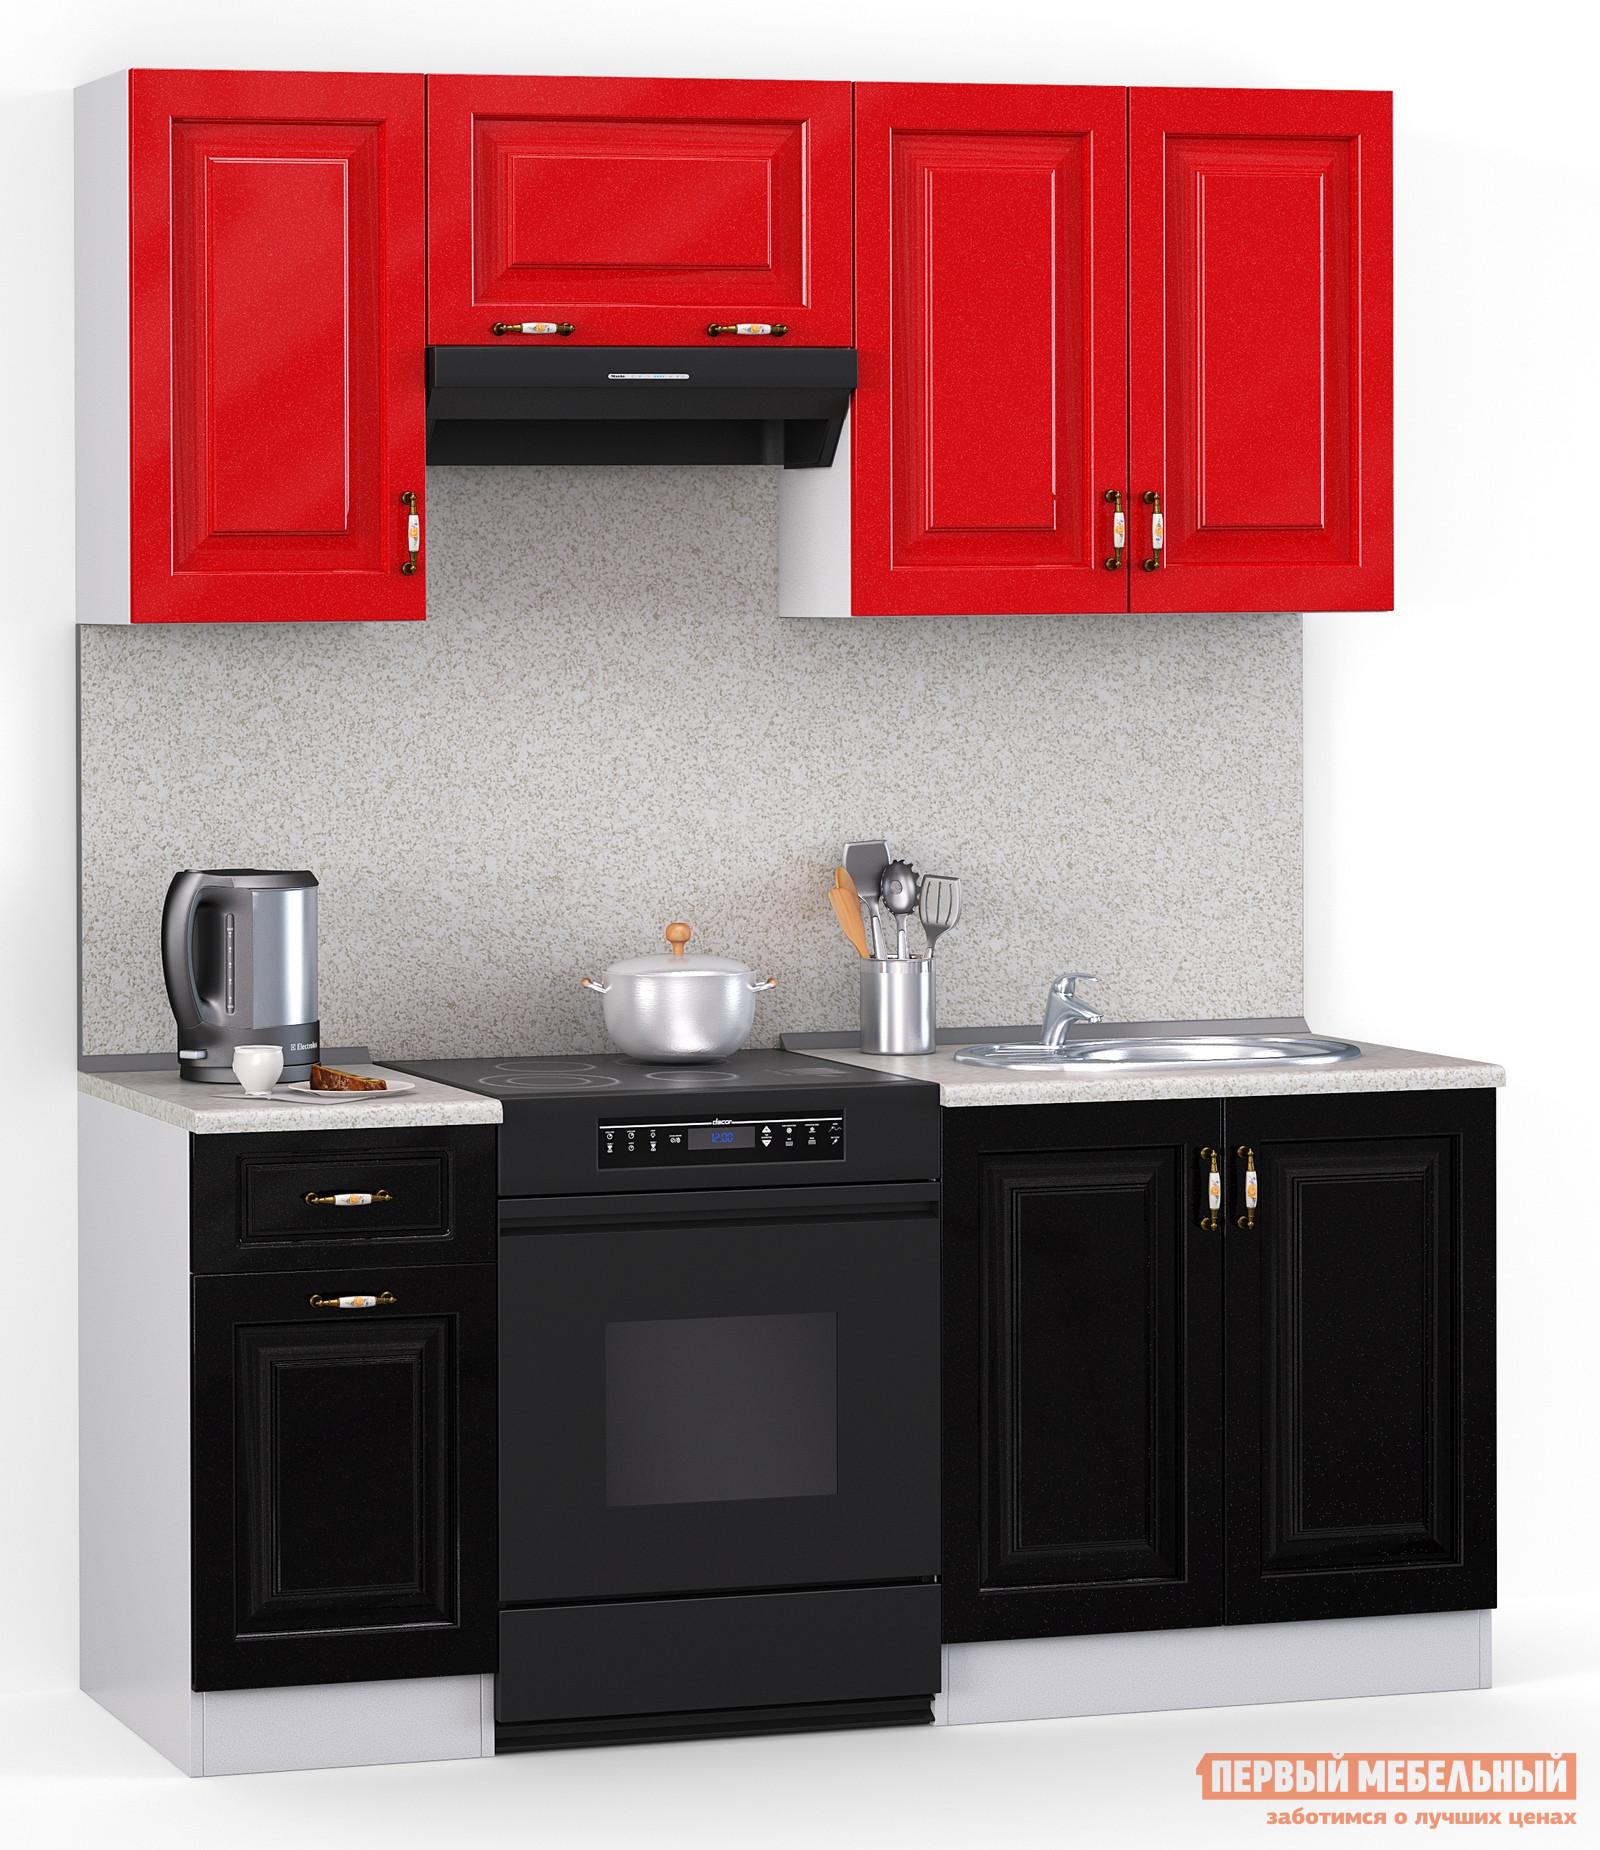 Кухонный гарнитур МегаЭлатон Лиана Декор МДФ 1800 кухонный гарнитур декор 1800 черный красный